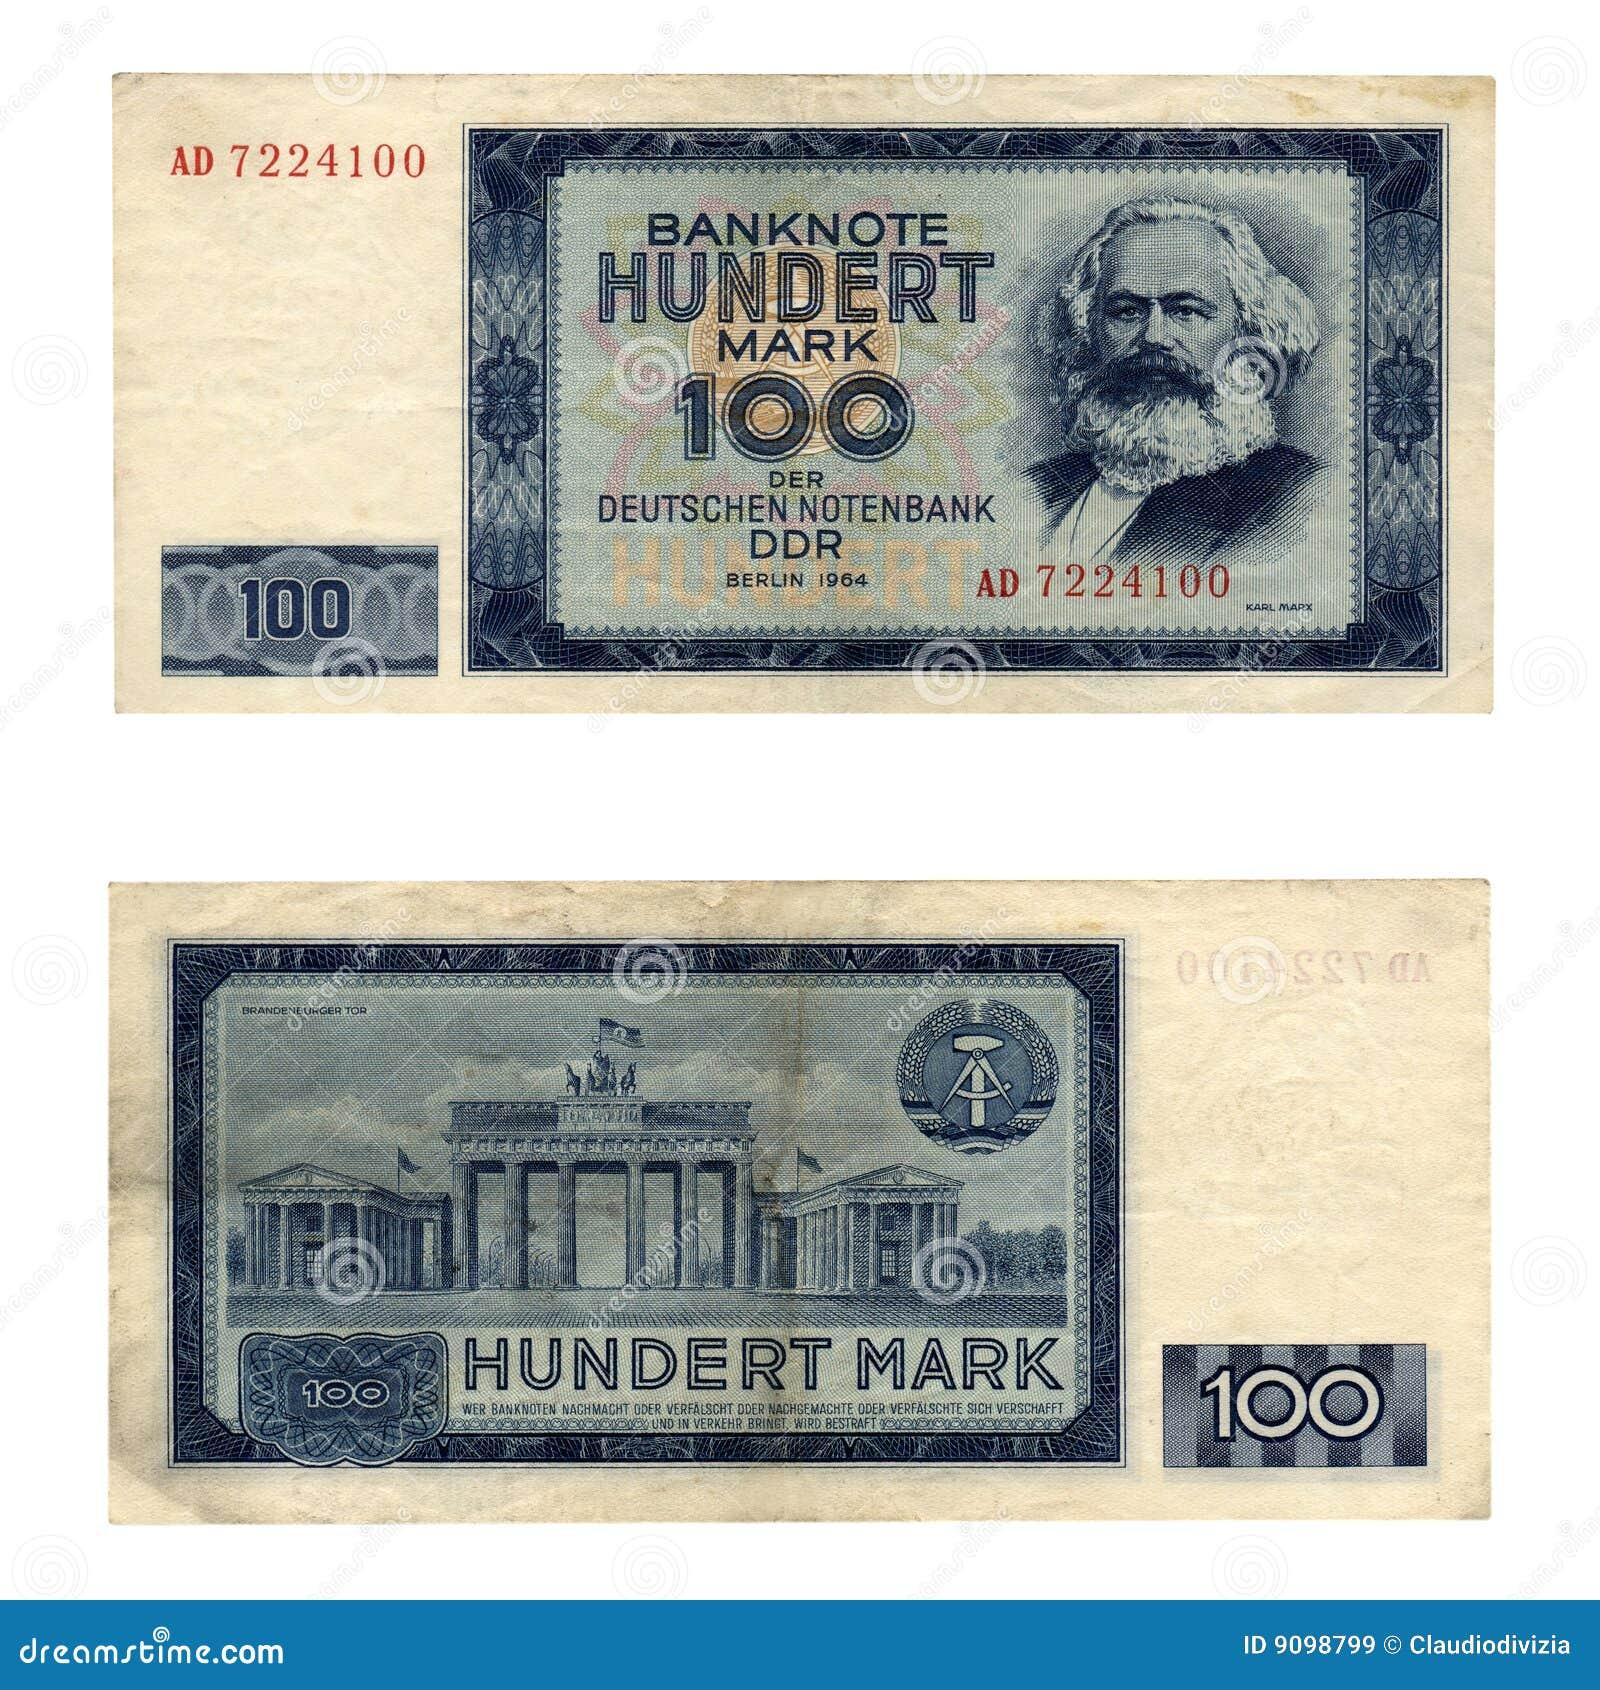 DDR-Banknote